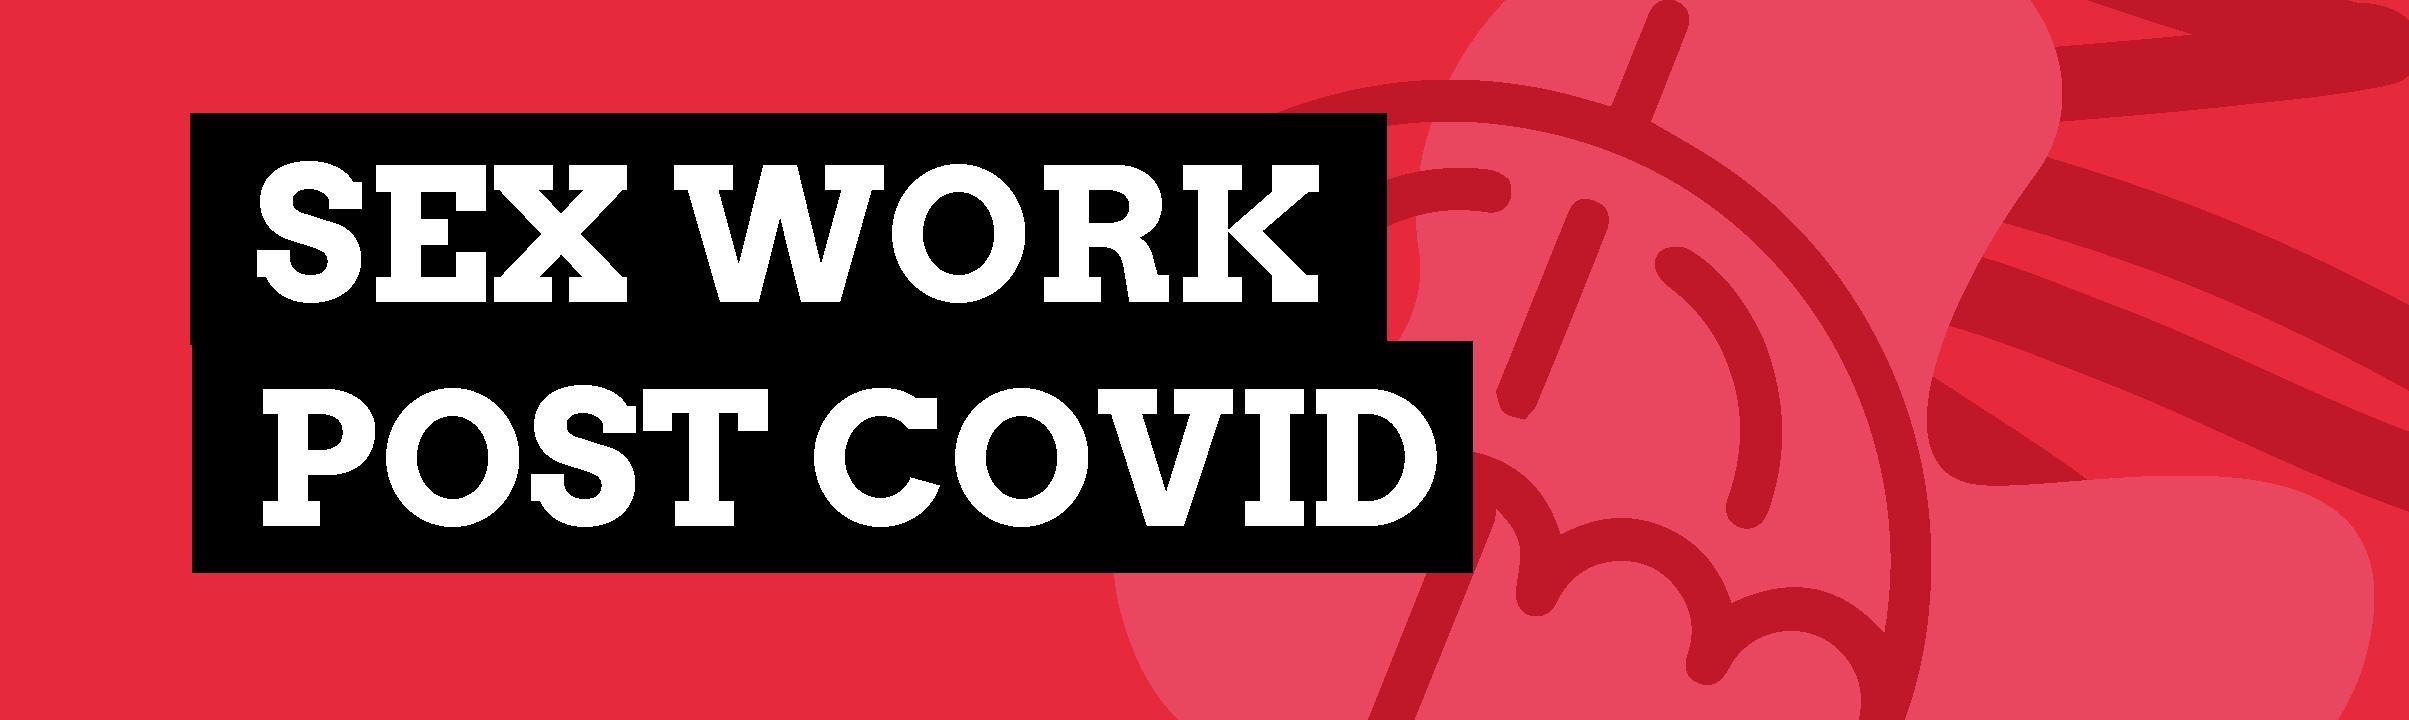 Sex work post-covid